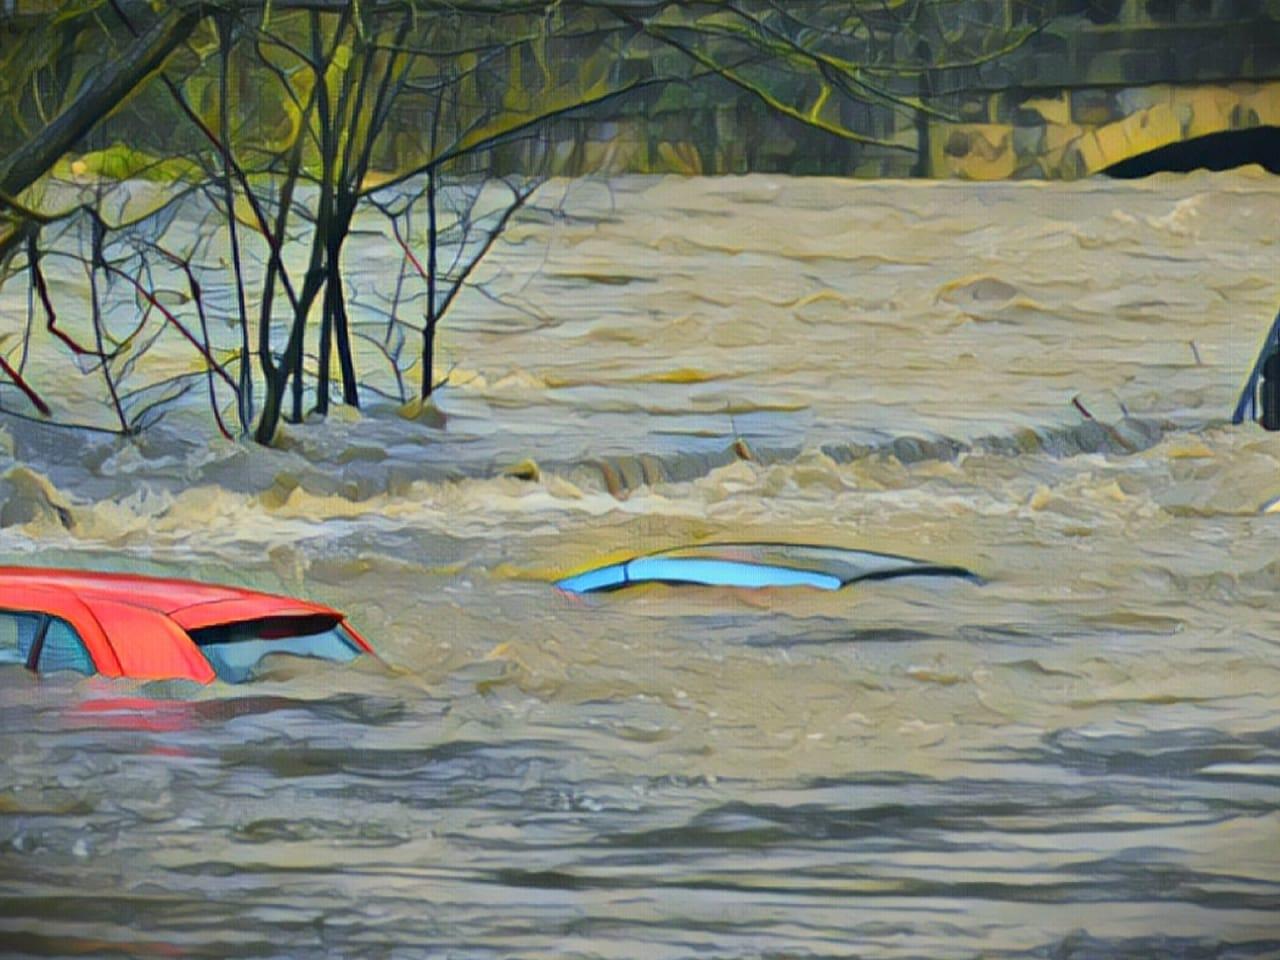 https: img.okezone.com content 2020 01 26 519 2158522 banjir-di-bojonegoro-akibat-hujan-deras-dan-air-sungai-pacal-meluap-sp7jDt8e6p.jpg